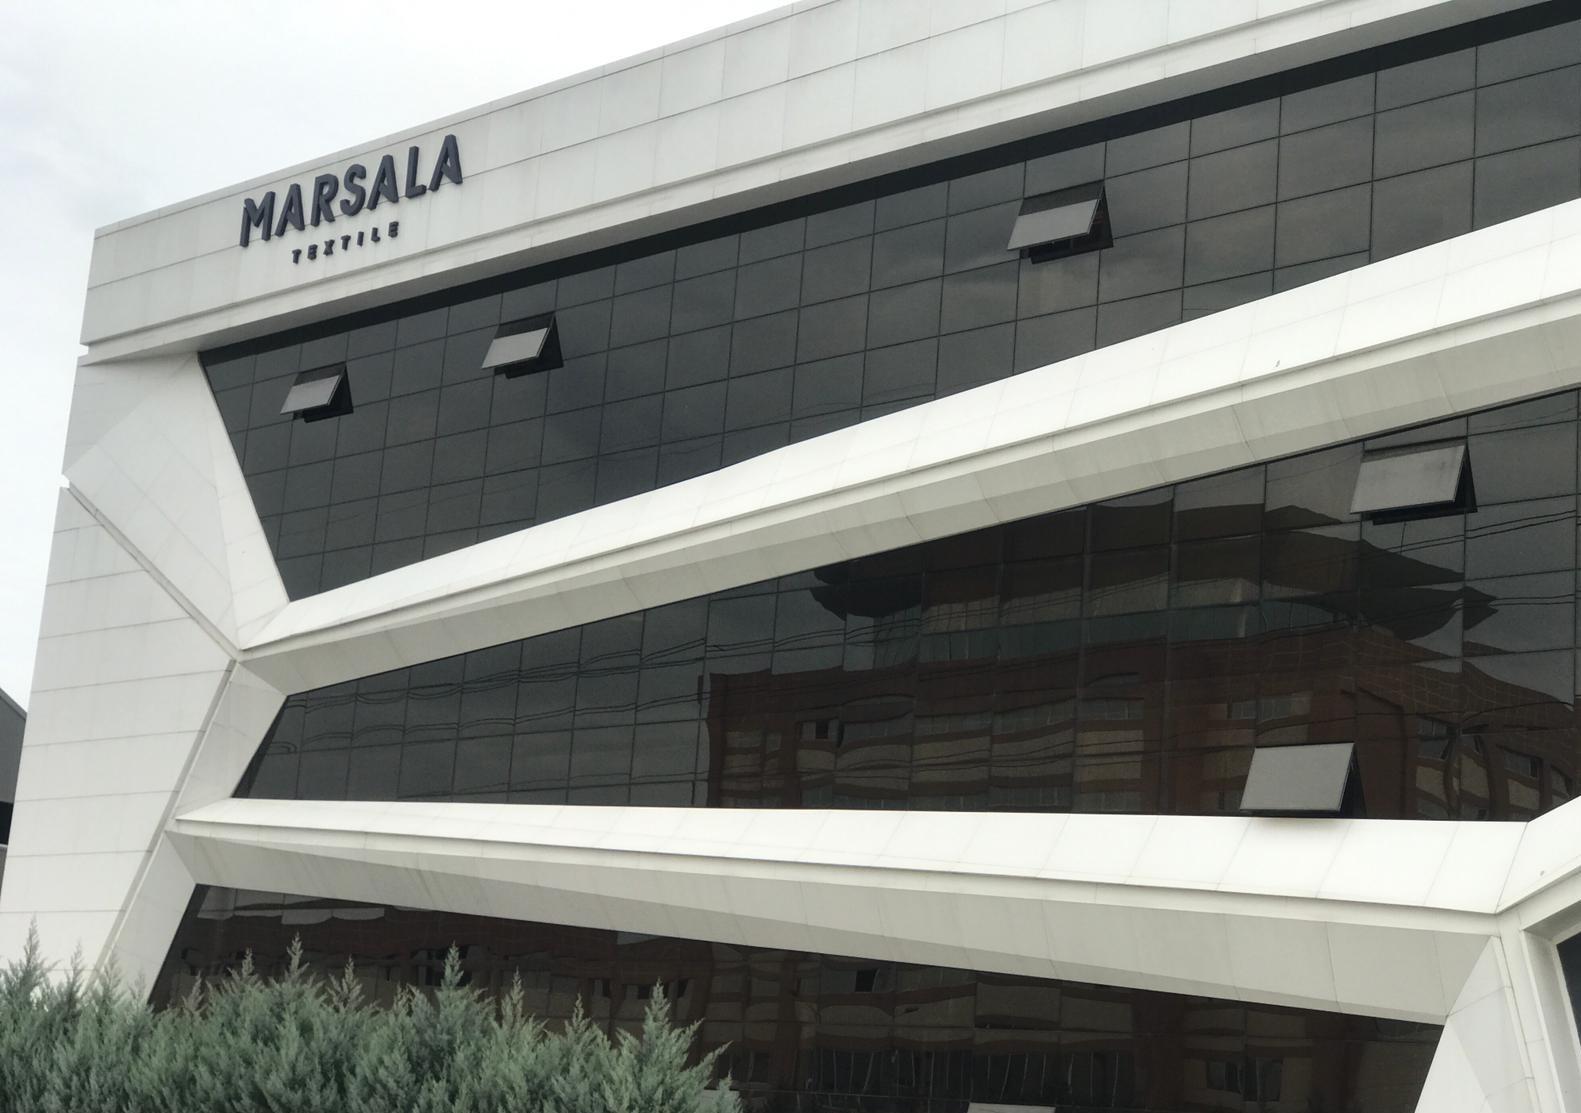 MARSALA TEXTILE